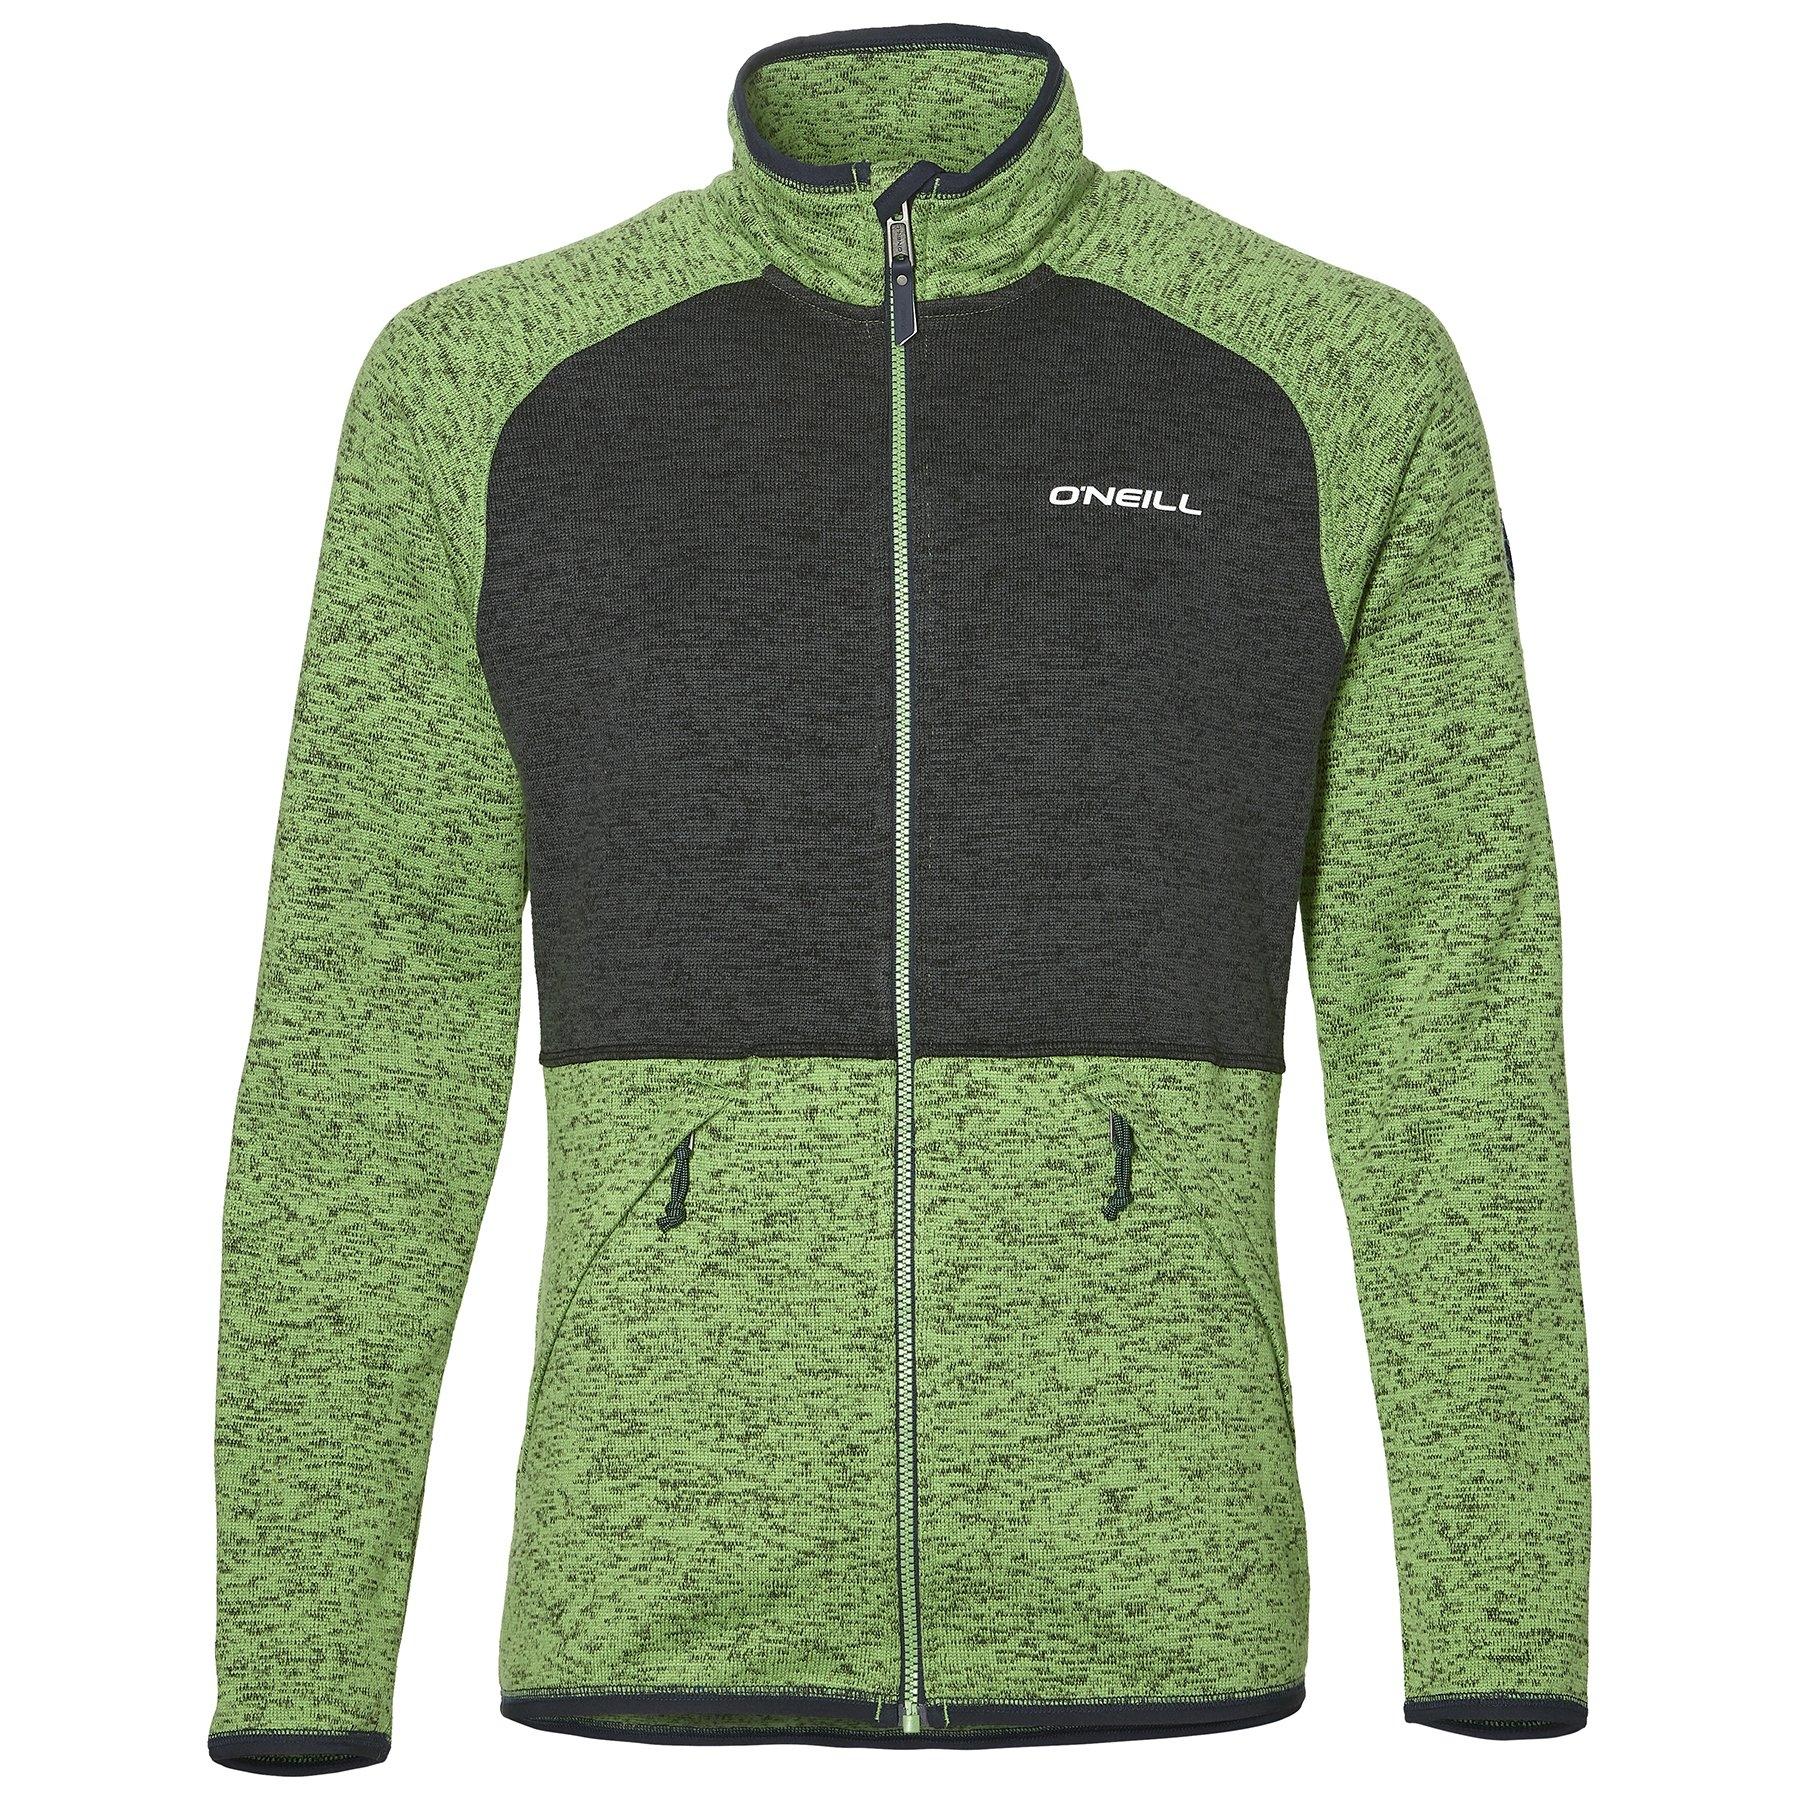 O'neill Fleece Vest »Piste fz fleece« bij OTTO online kopen